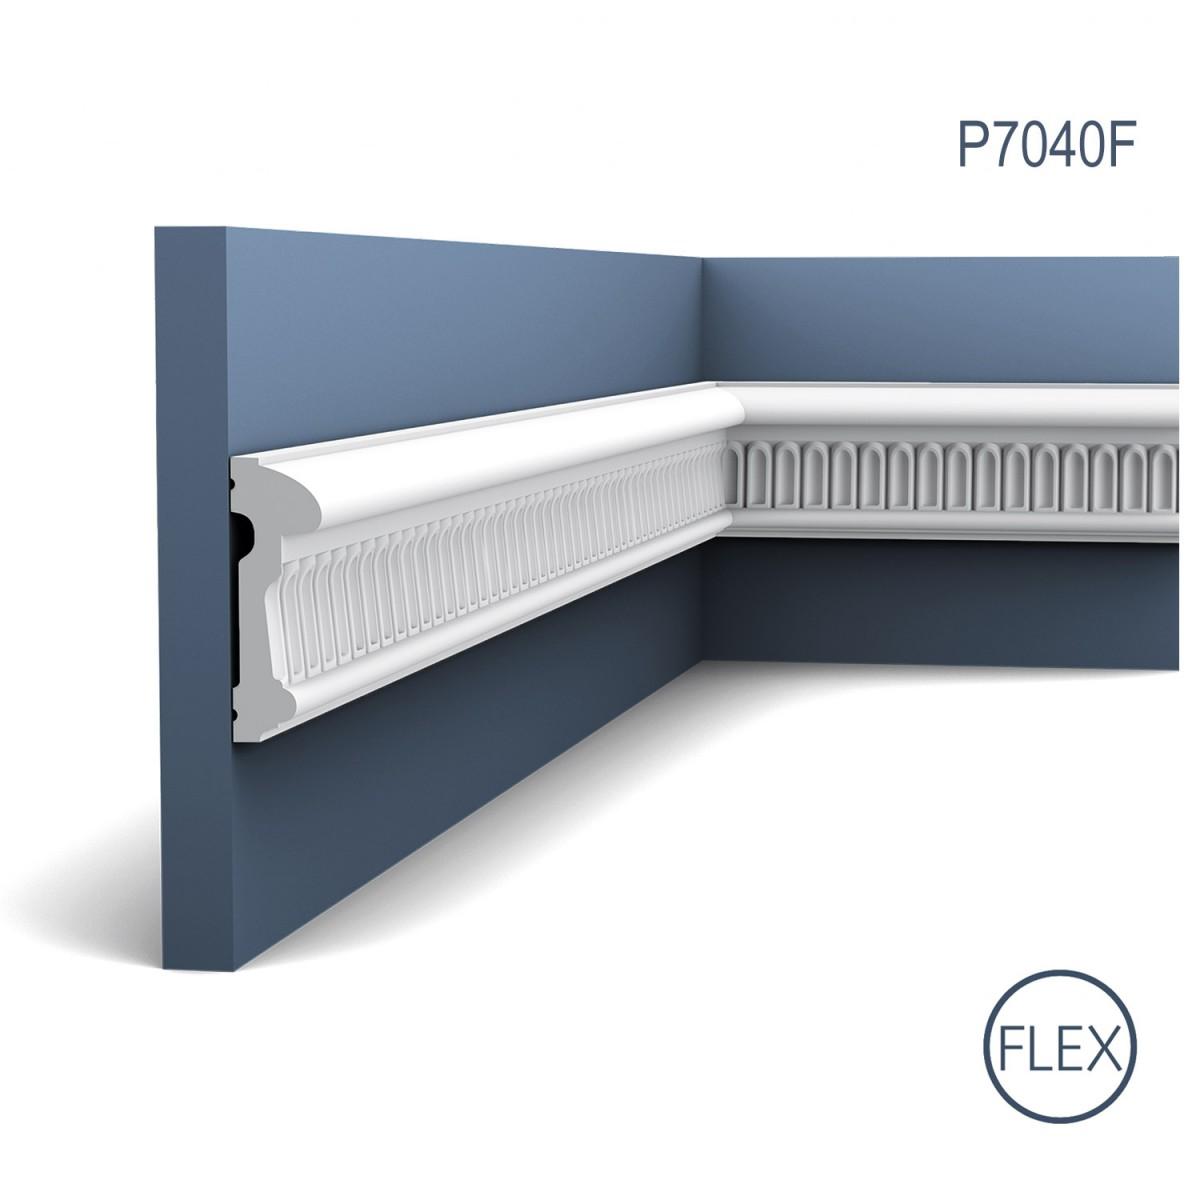 Brau Flex Luxxus P7040F, Dimensiuni: 200 X 7.9 X 2.6 cm, Orac Decor